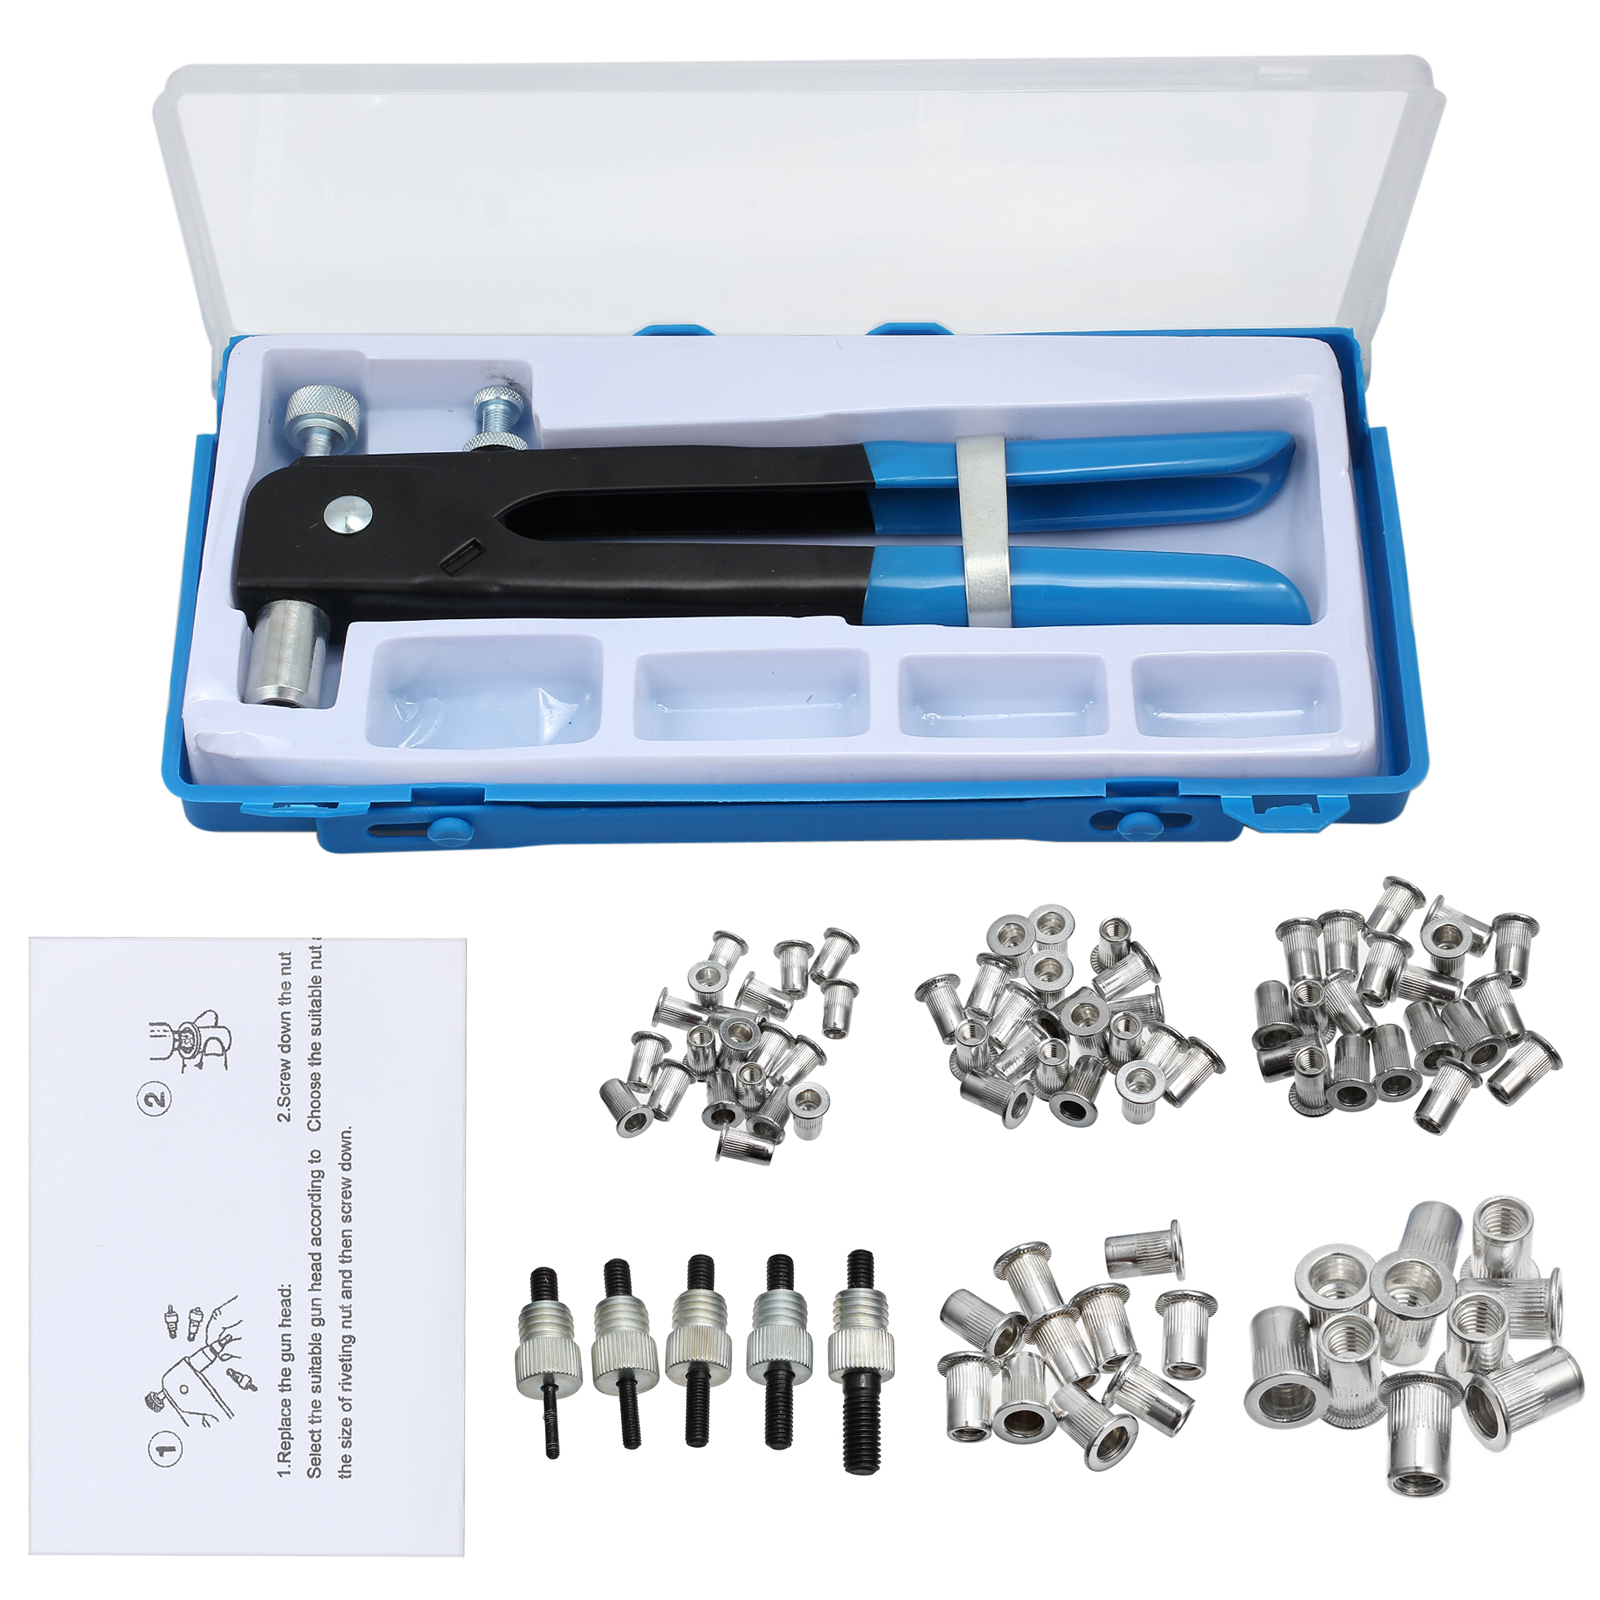 Details about 86pcs Threaded Nut Rivet Tool Riveter Rivnut Nutsert Gun  Riveting Kit M3-M8